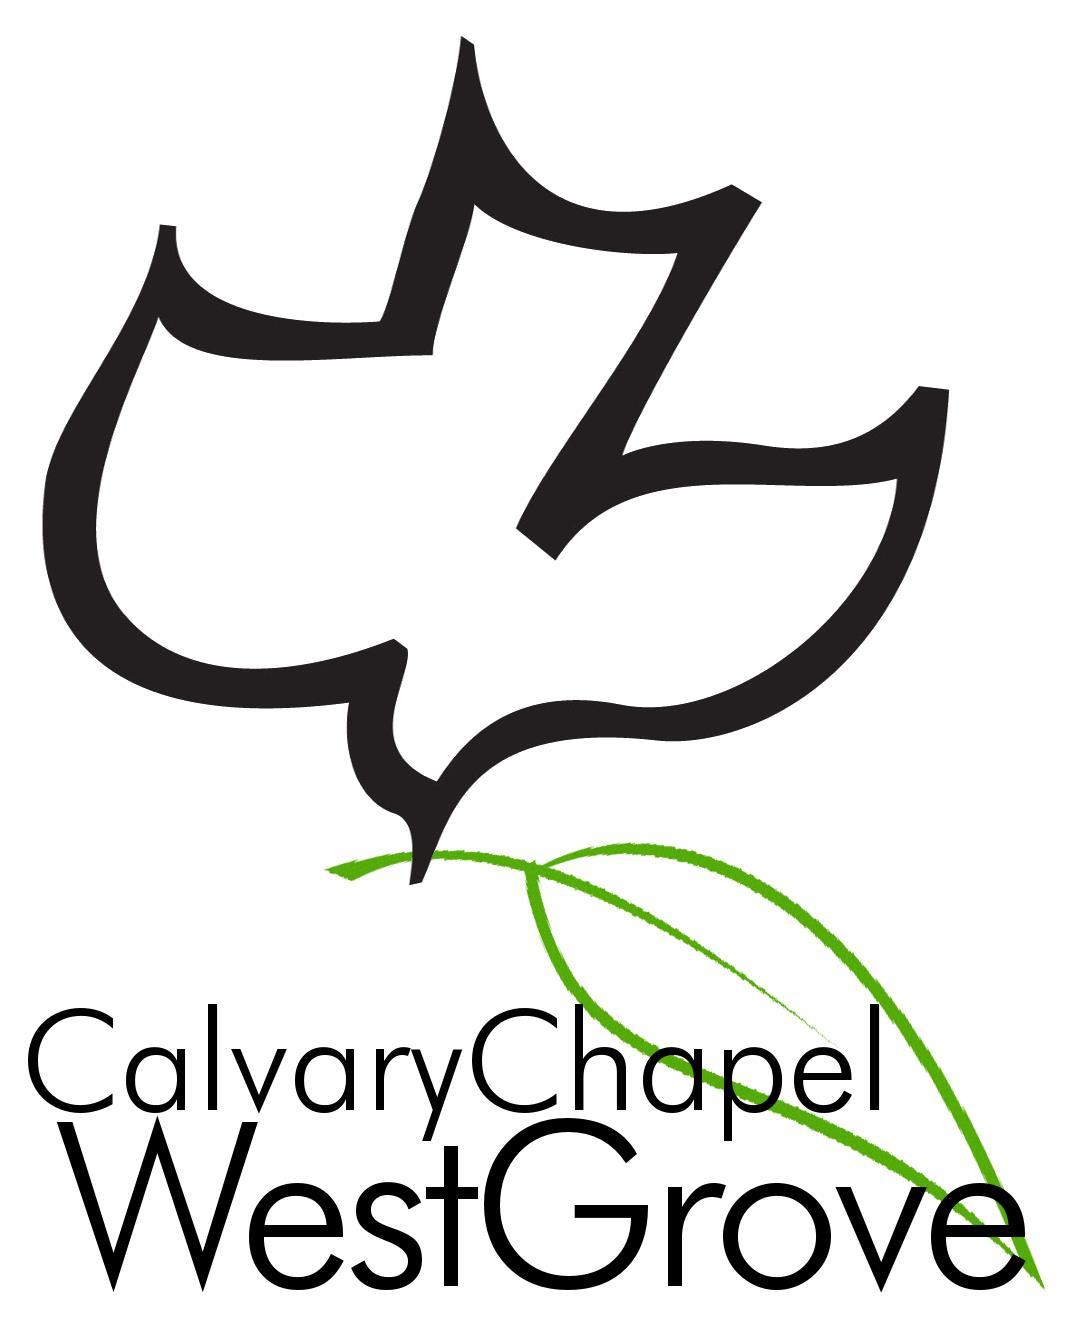 Calvary Chapel Westgrove